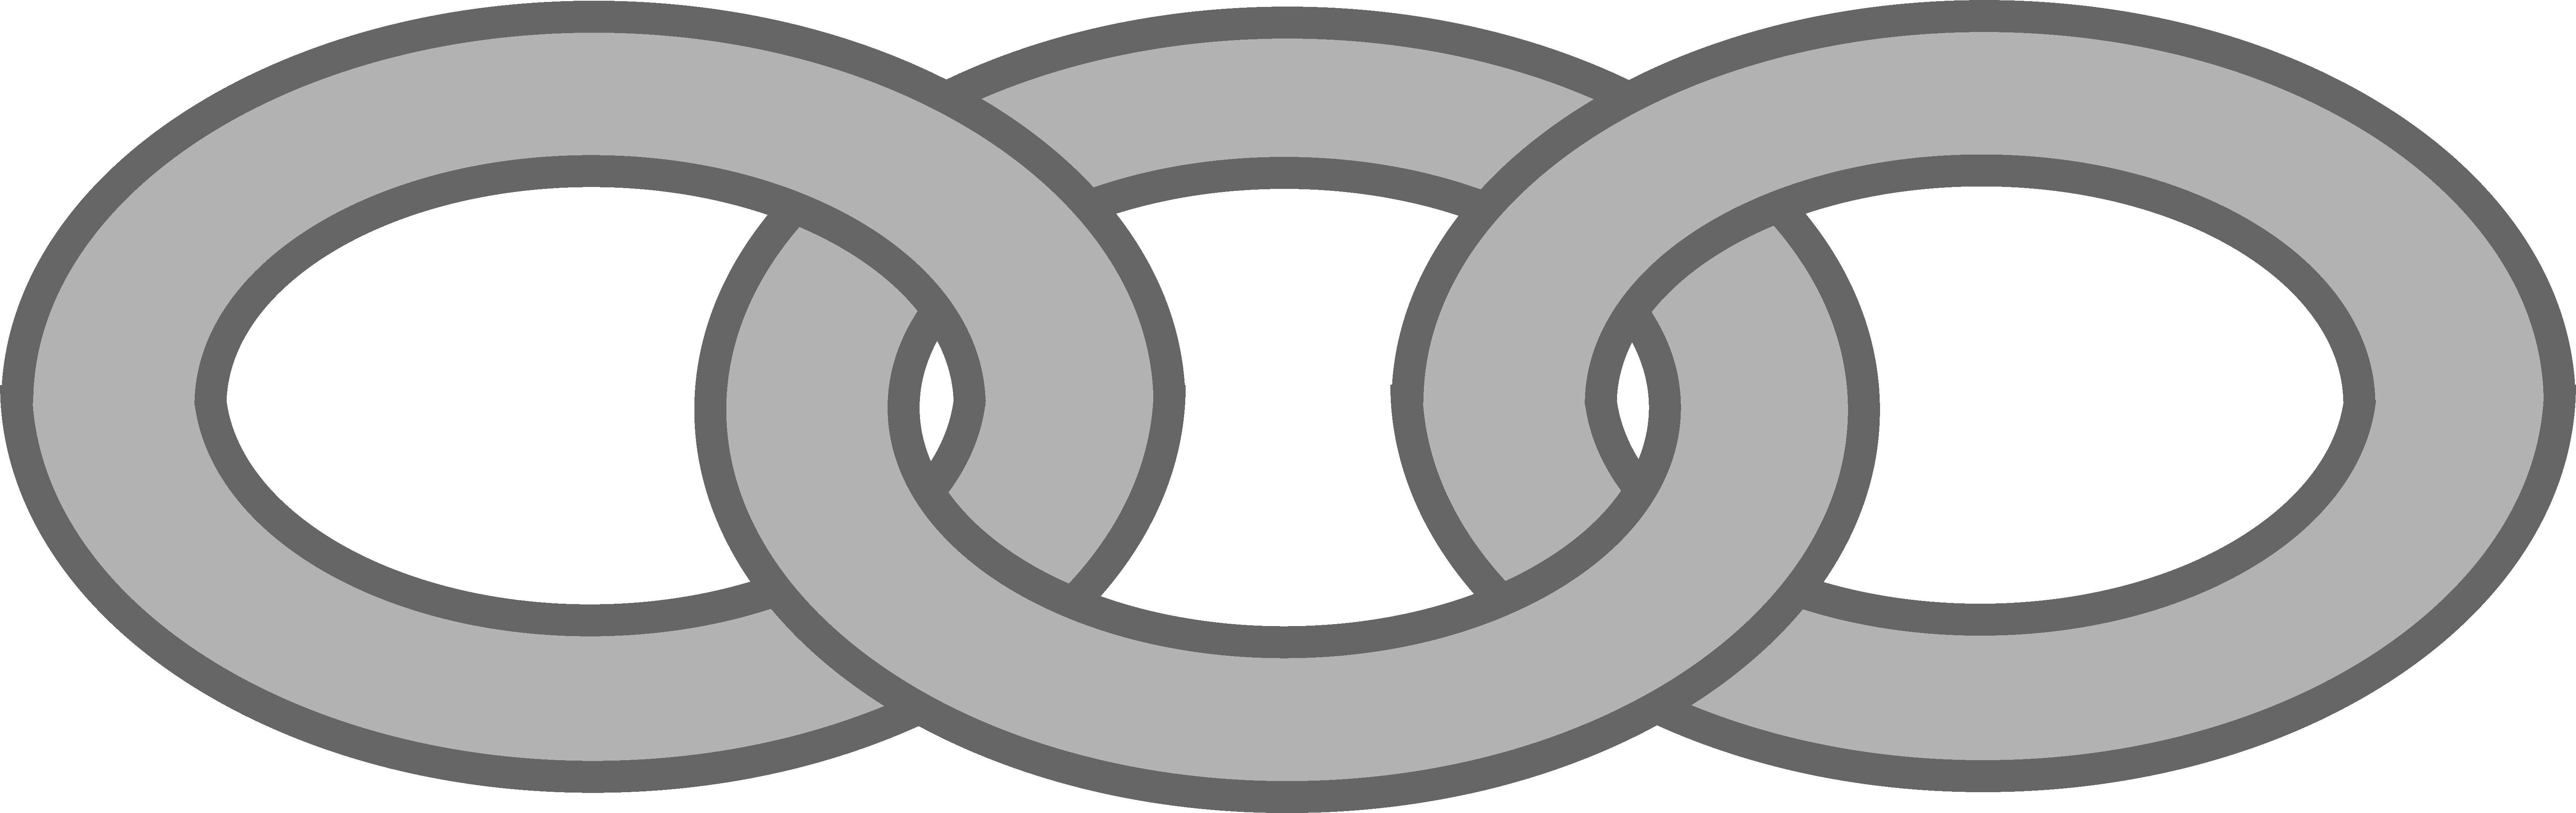 Chain clip art free. News clipart breaking